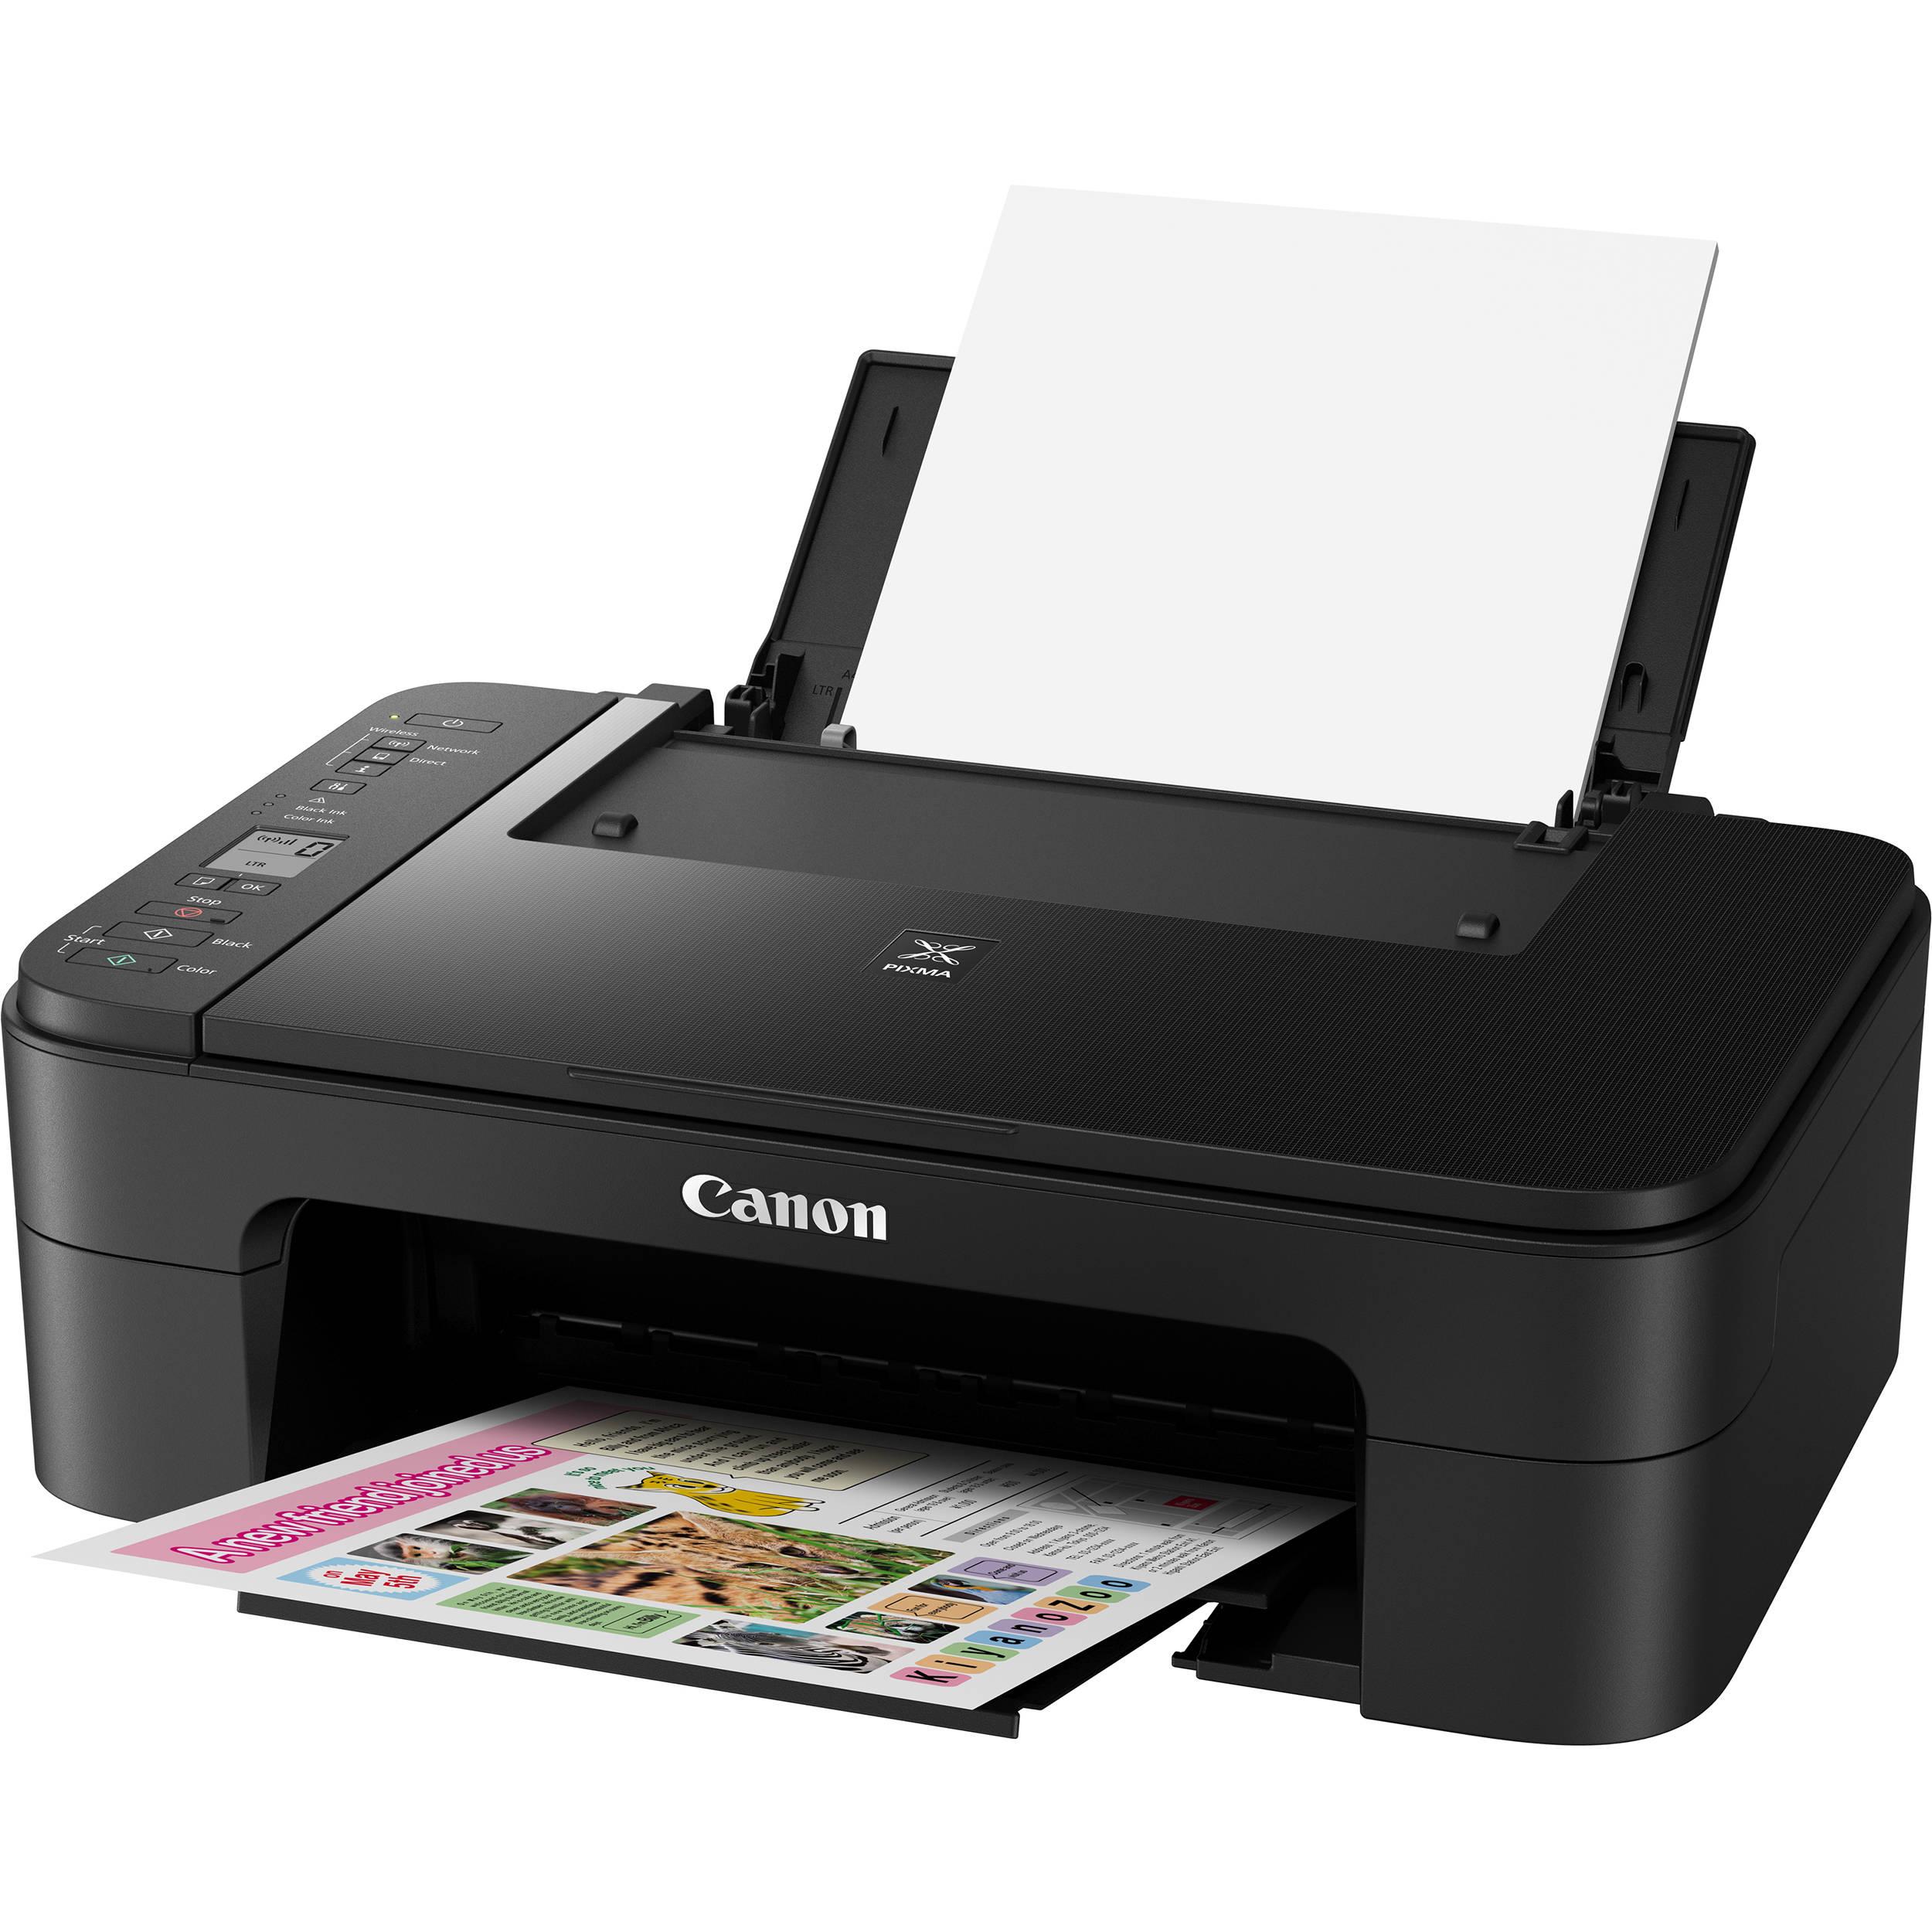 canon pixma ts3120 wireless all in one inkjet printer 2226c002. Black Bedroom Furniture Sets. Home Design Ideas